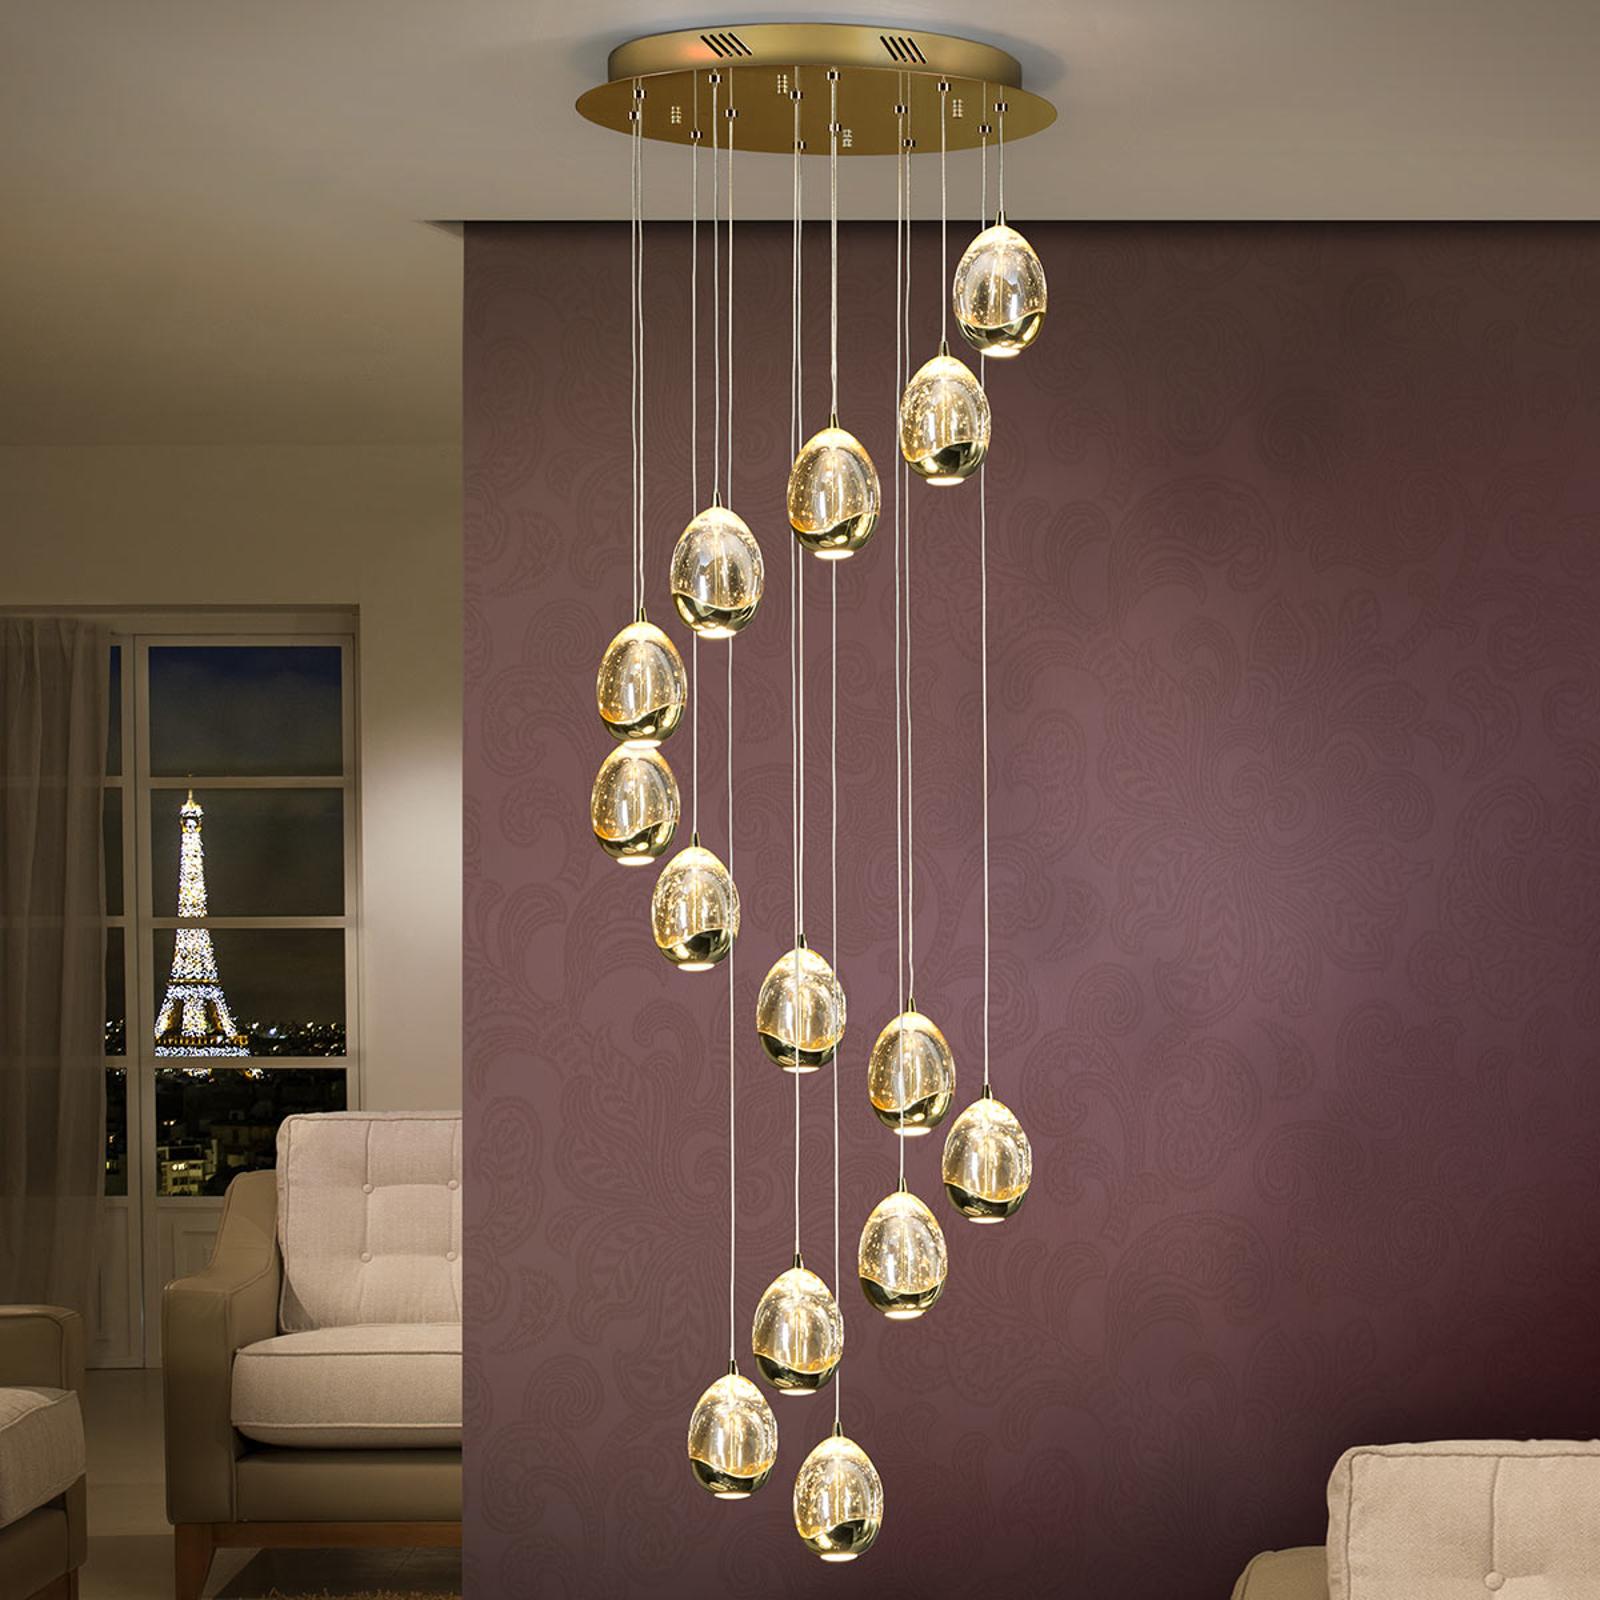 LED-pendellampe Rocio, 14 lyskilder, gull